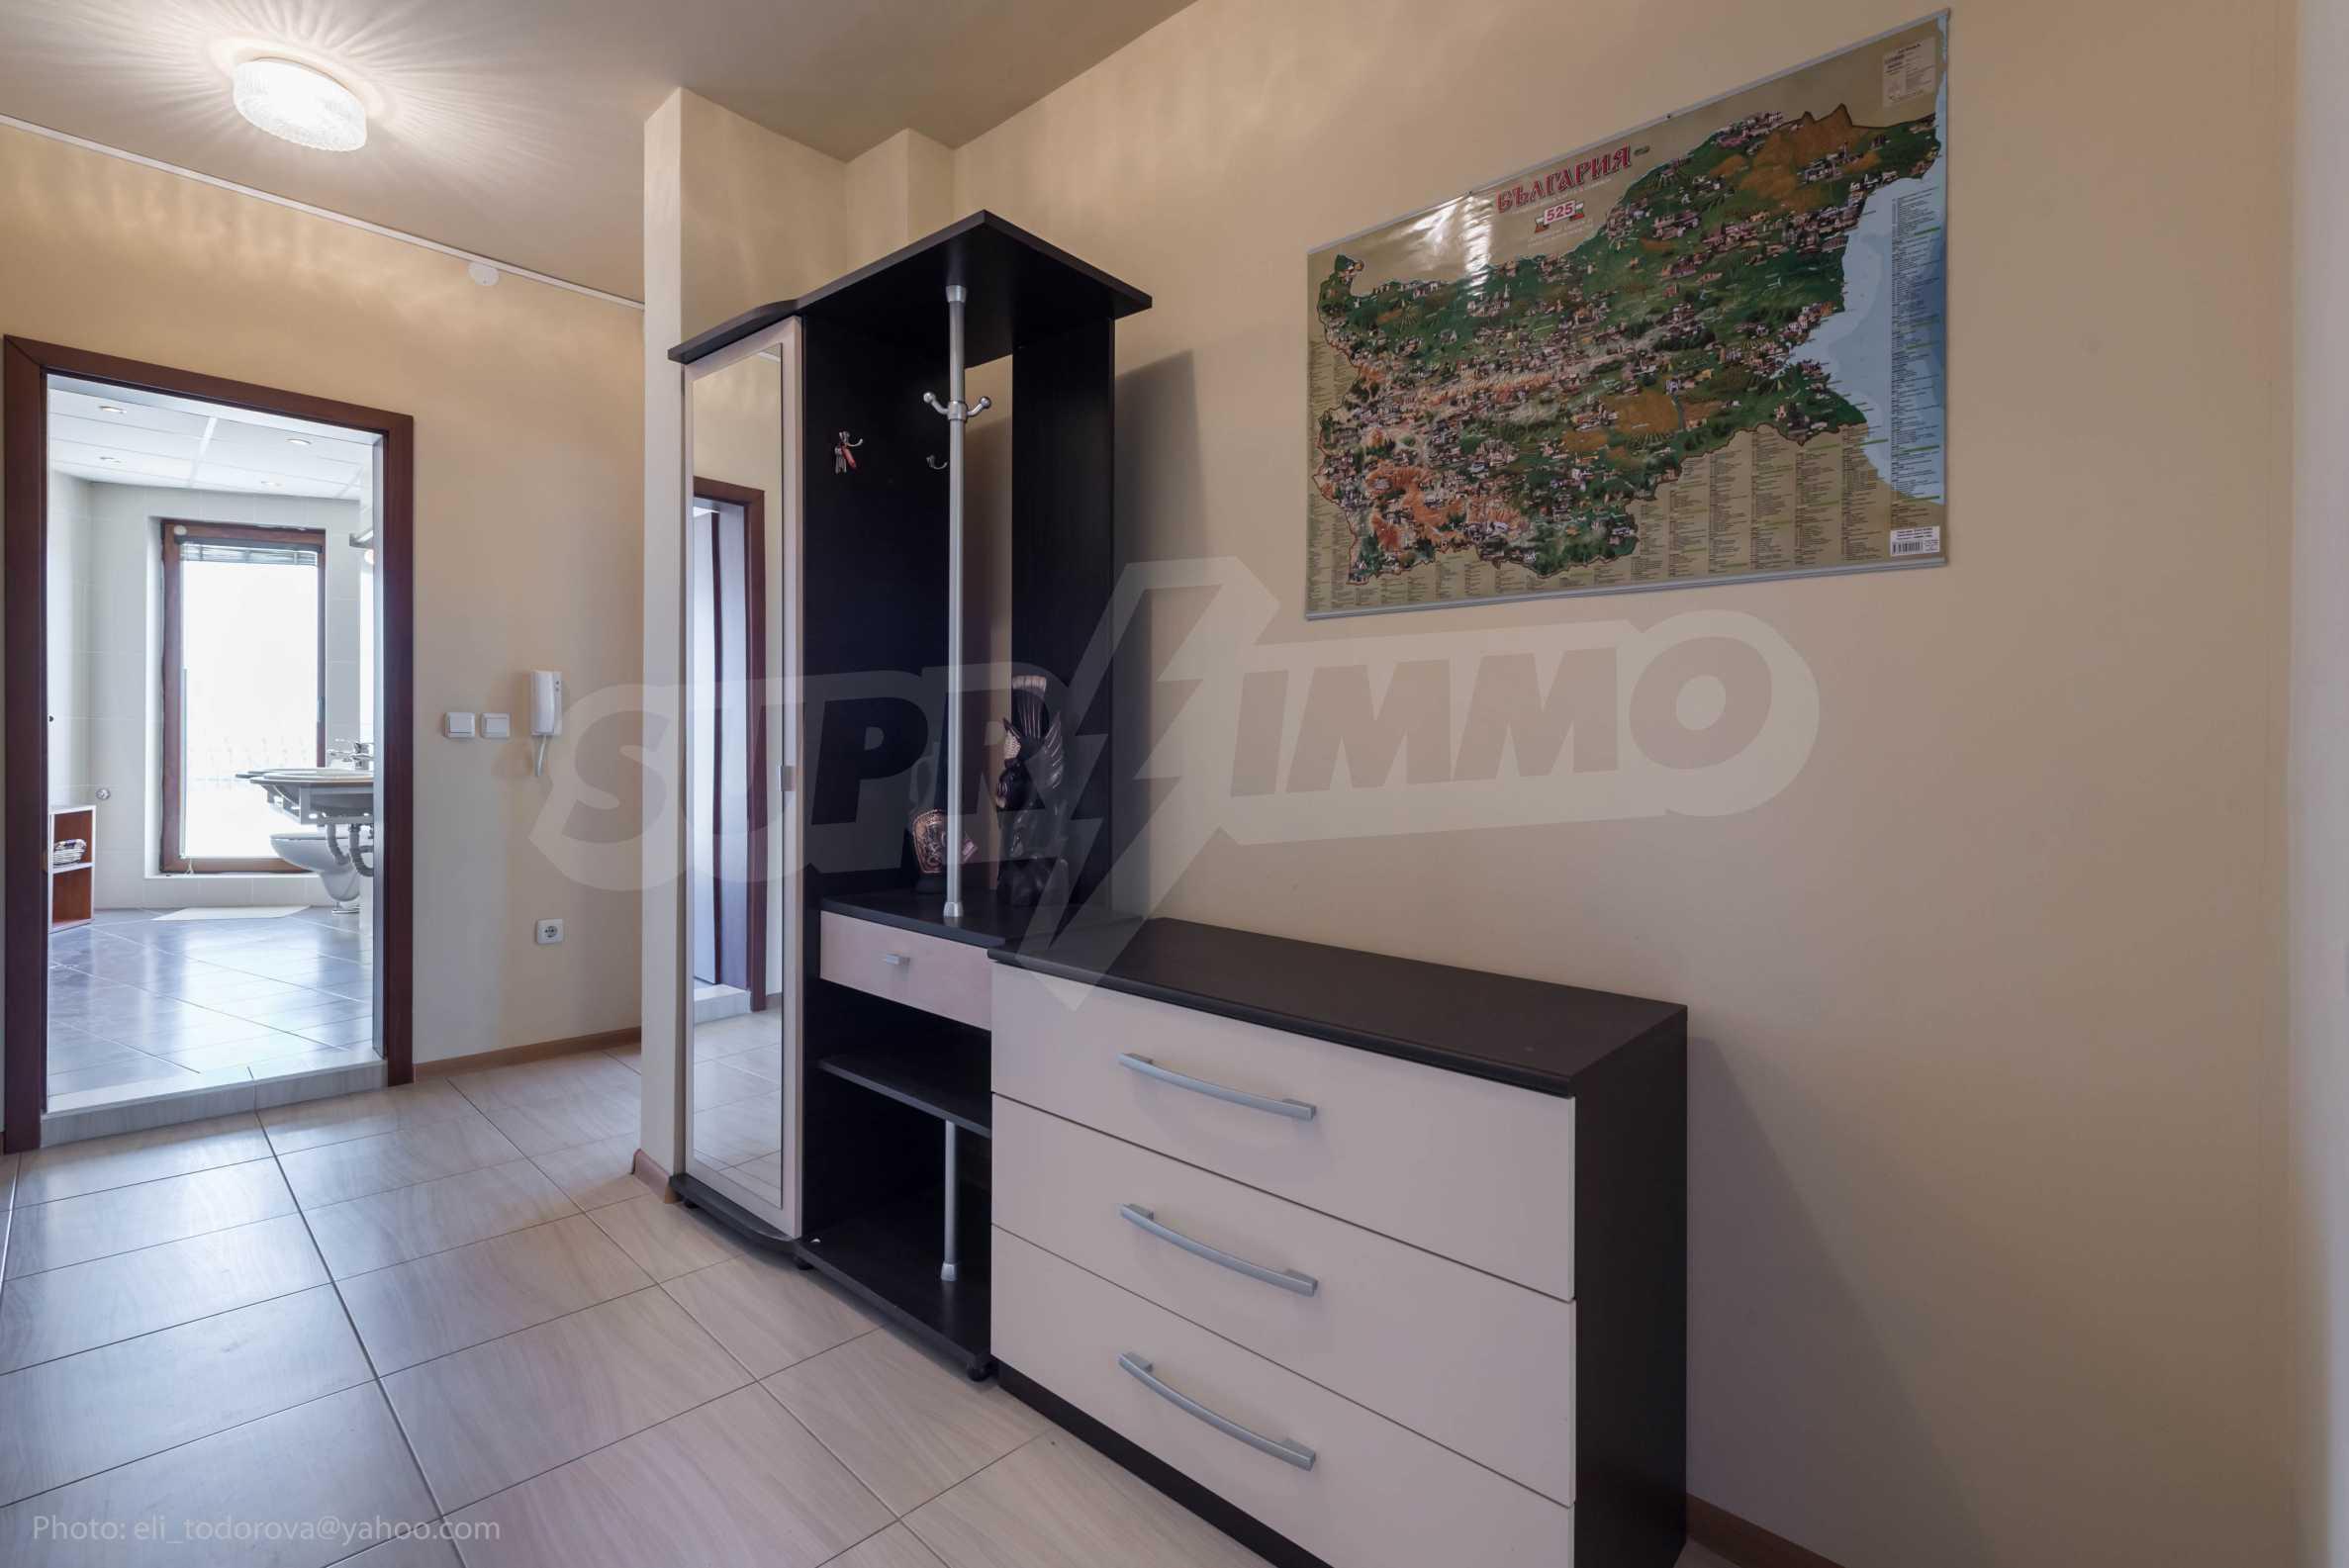 Panorama Wohnung 31